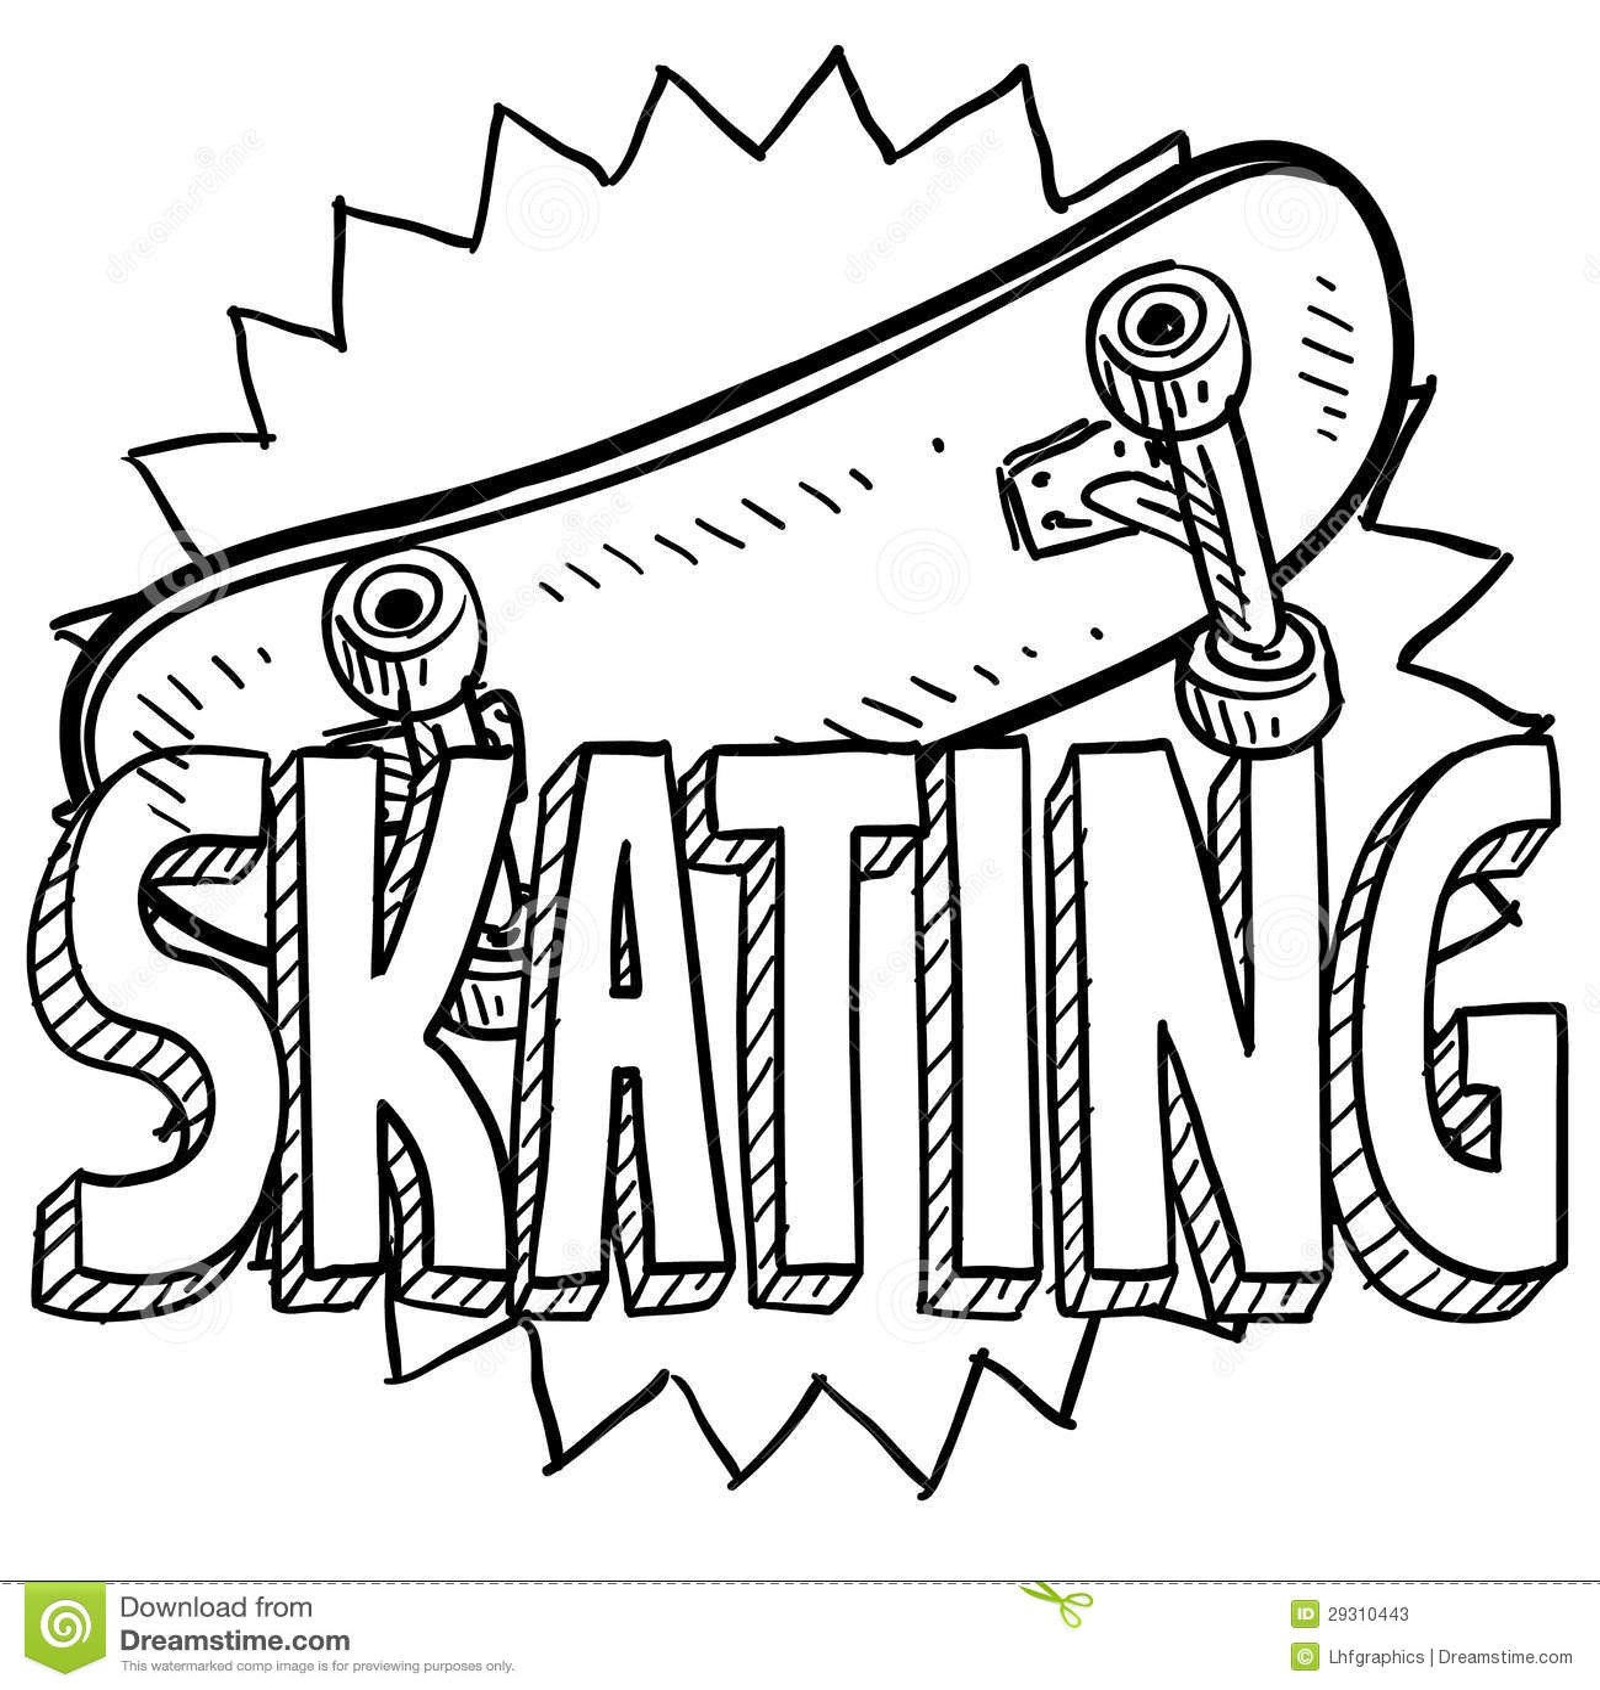 Skateboarding Sketch Stock Vector Illustration Of Pads